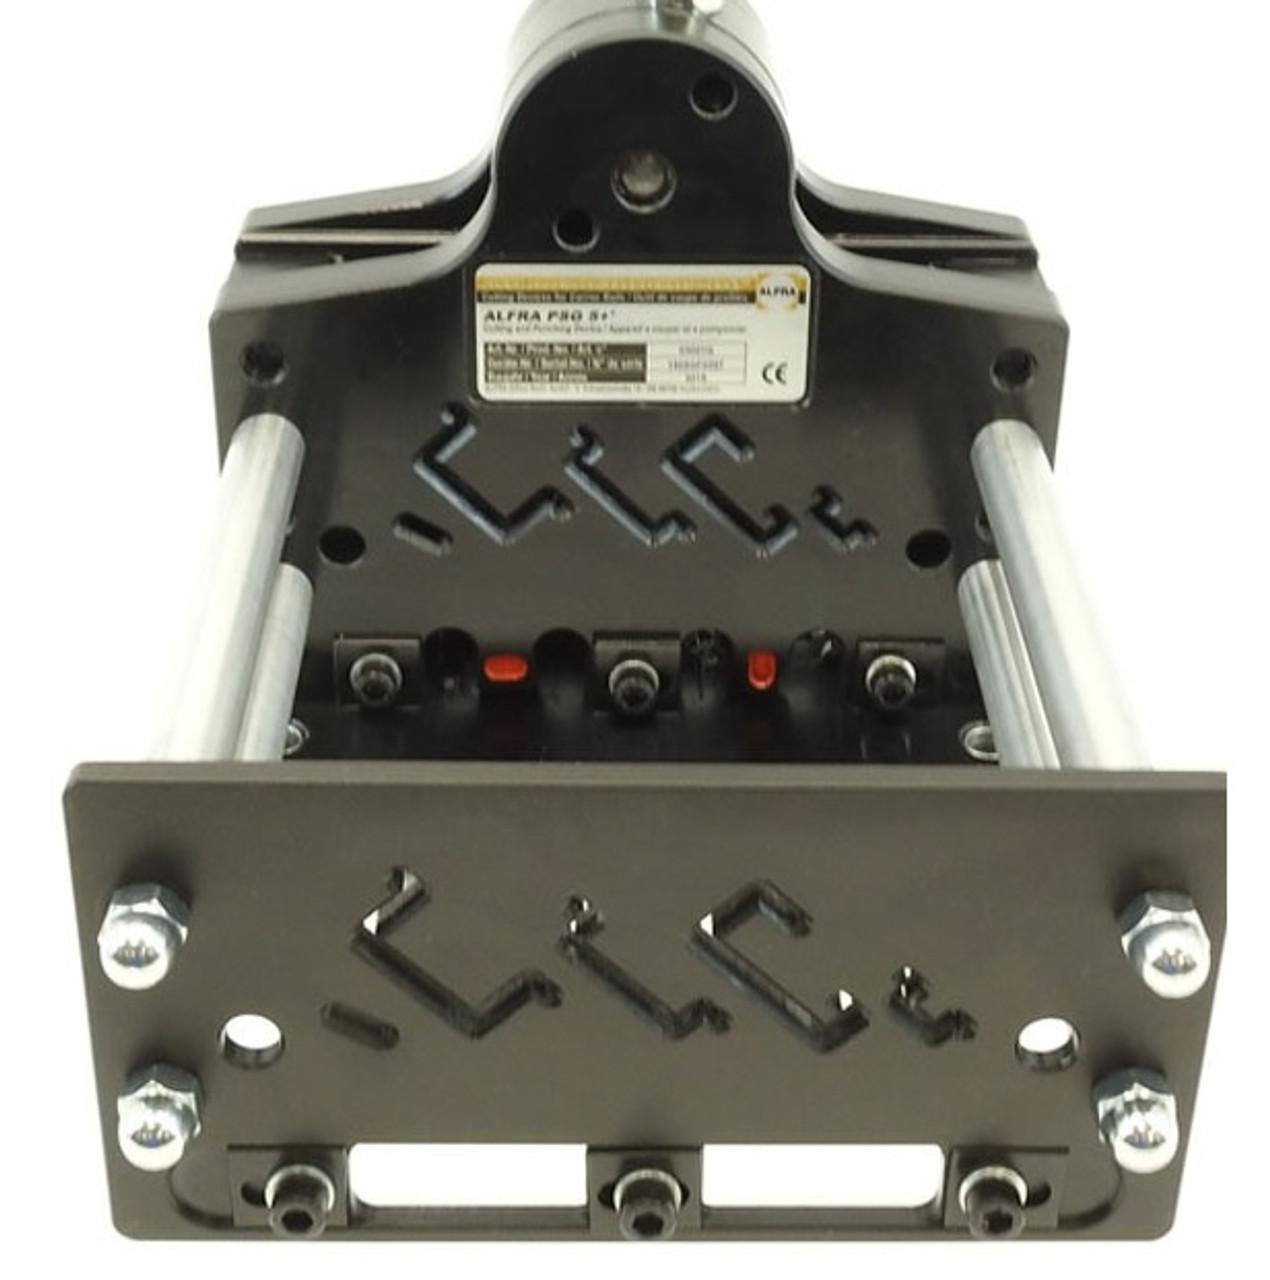 "Alfra PSG 5+ Multi-Profile DIN Rail Cutter with ""G"" rail profile."